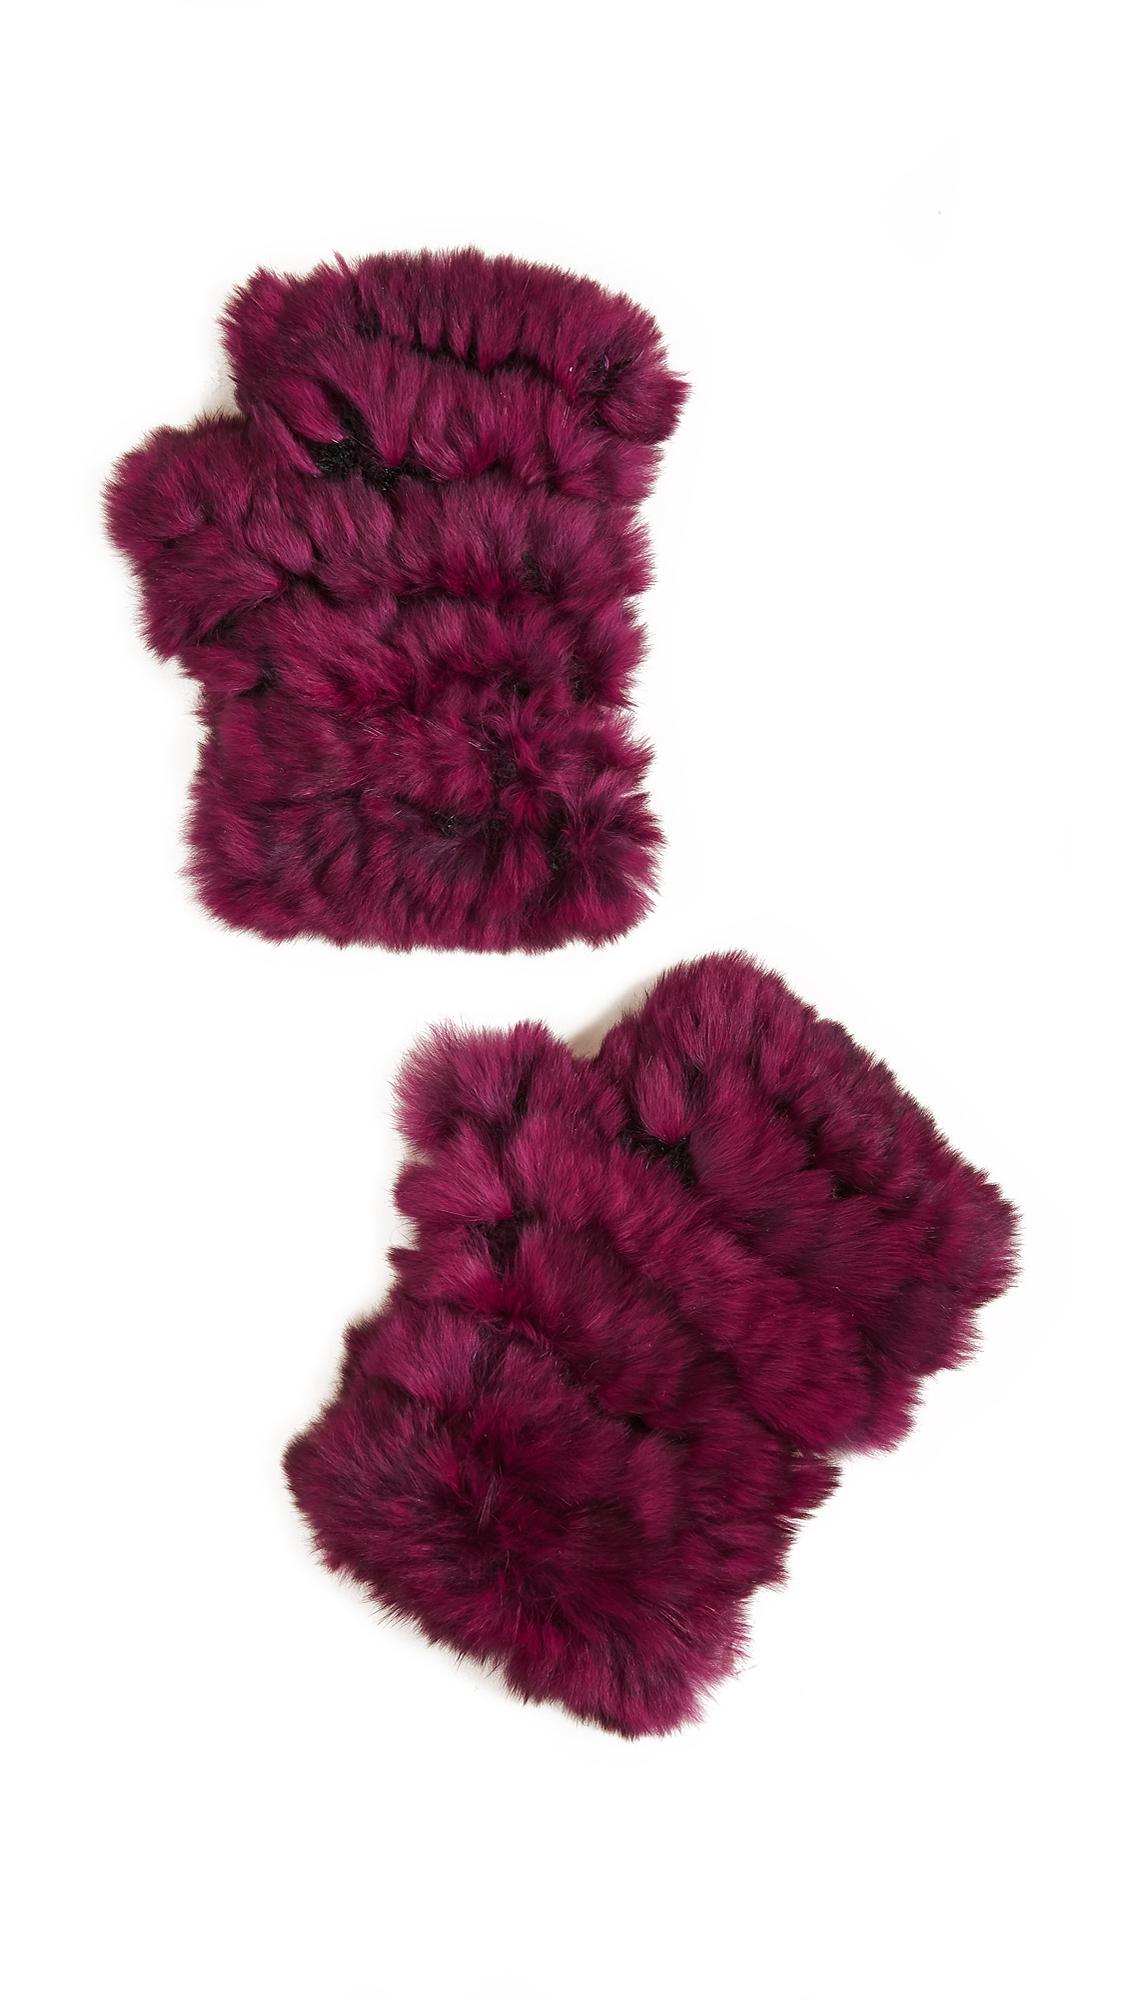 Jocelyn Fingerless Fur Gloves - Ruby